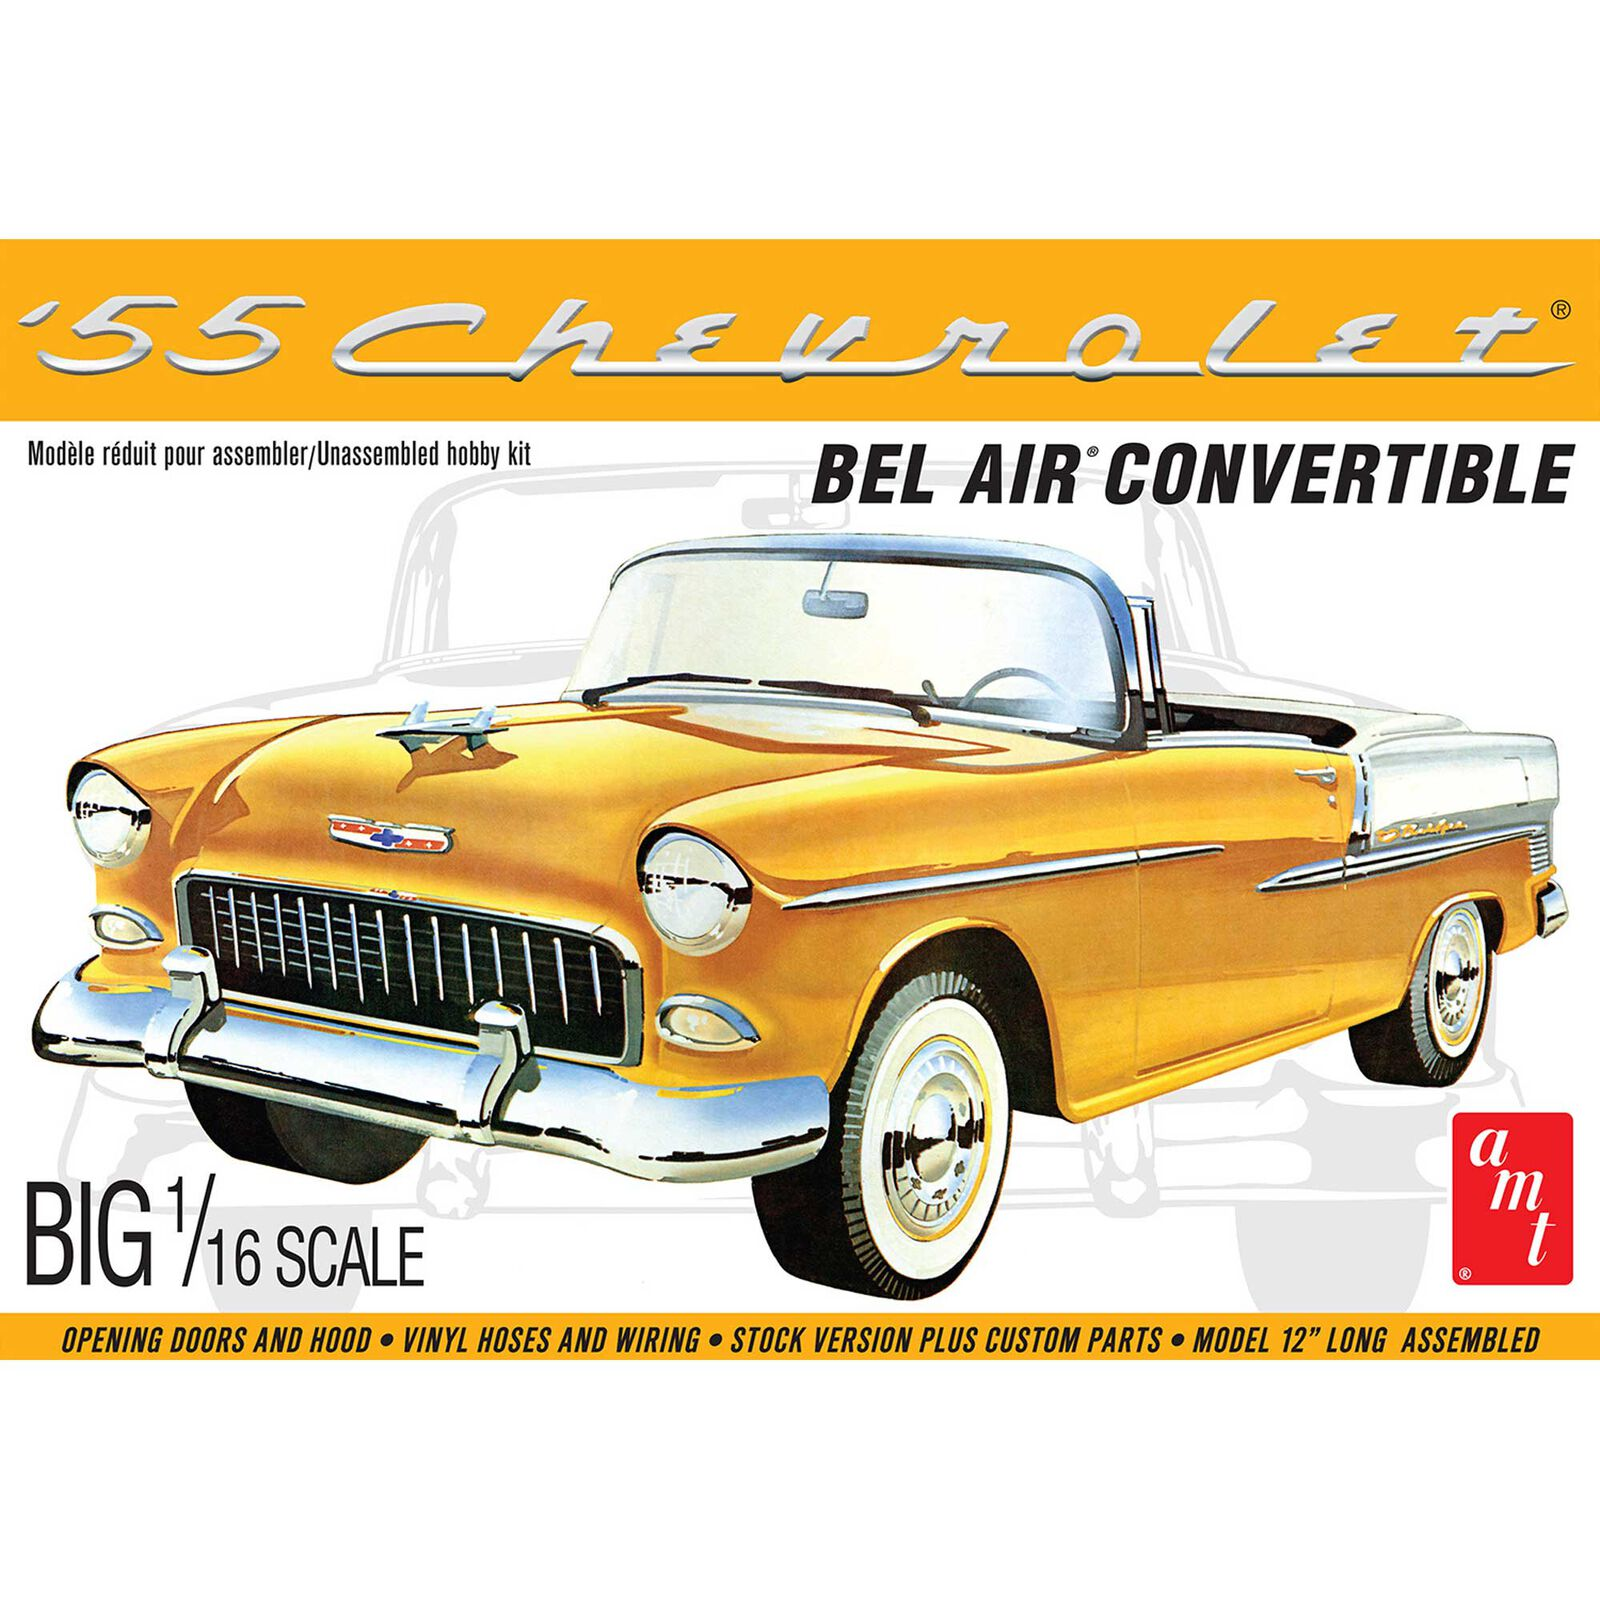 1/16 1955 Chevy Bel Air Convertible, Model Kit